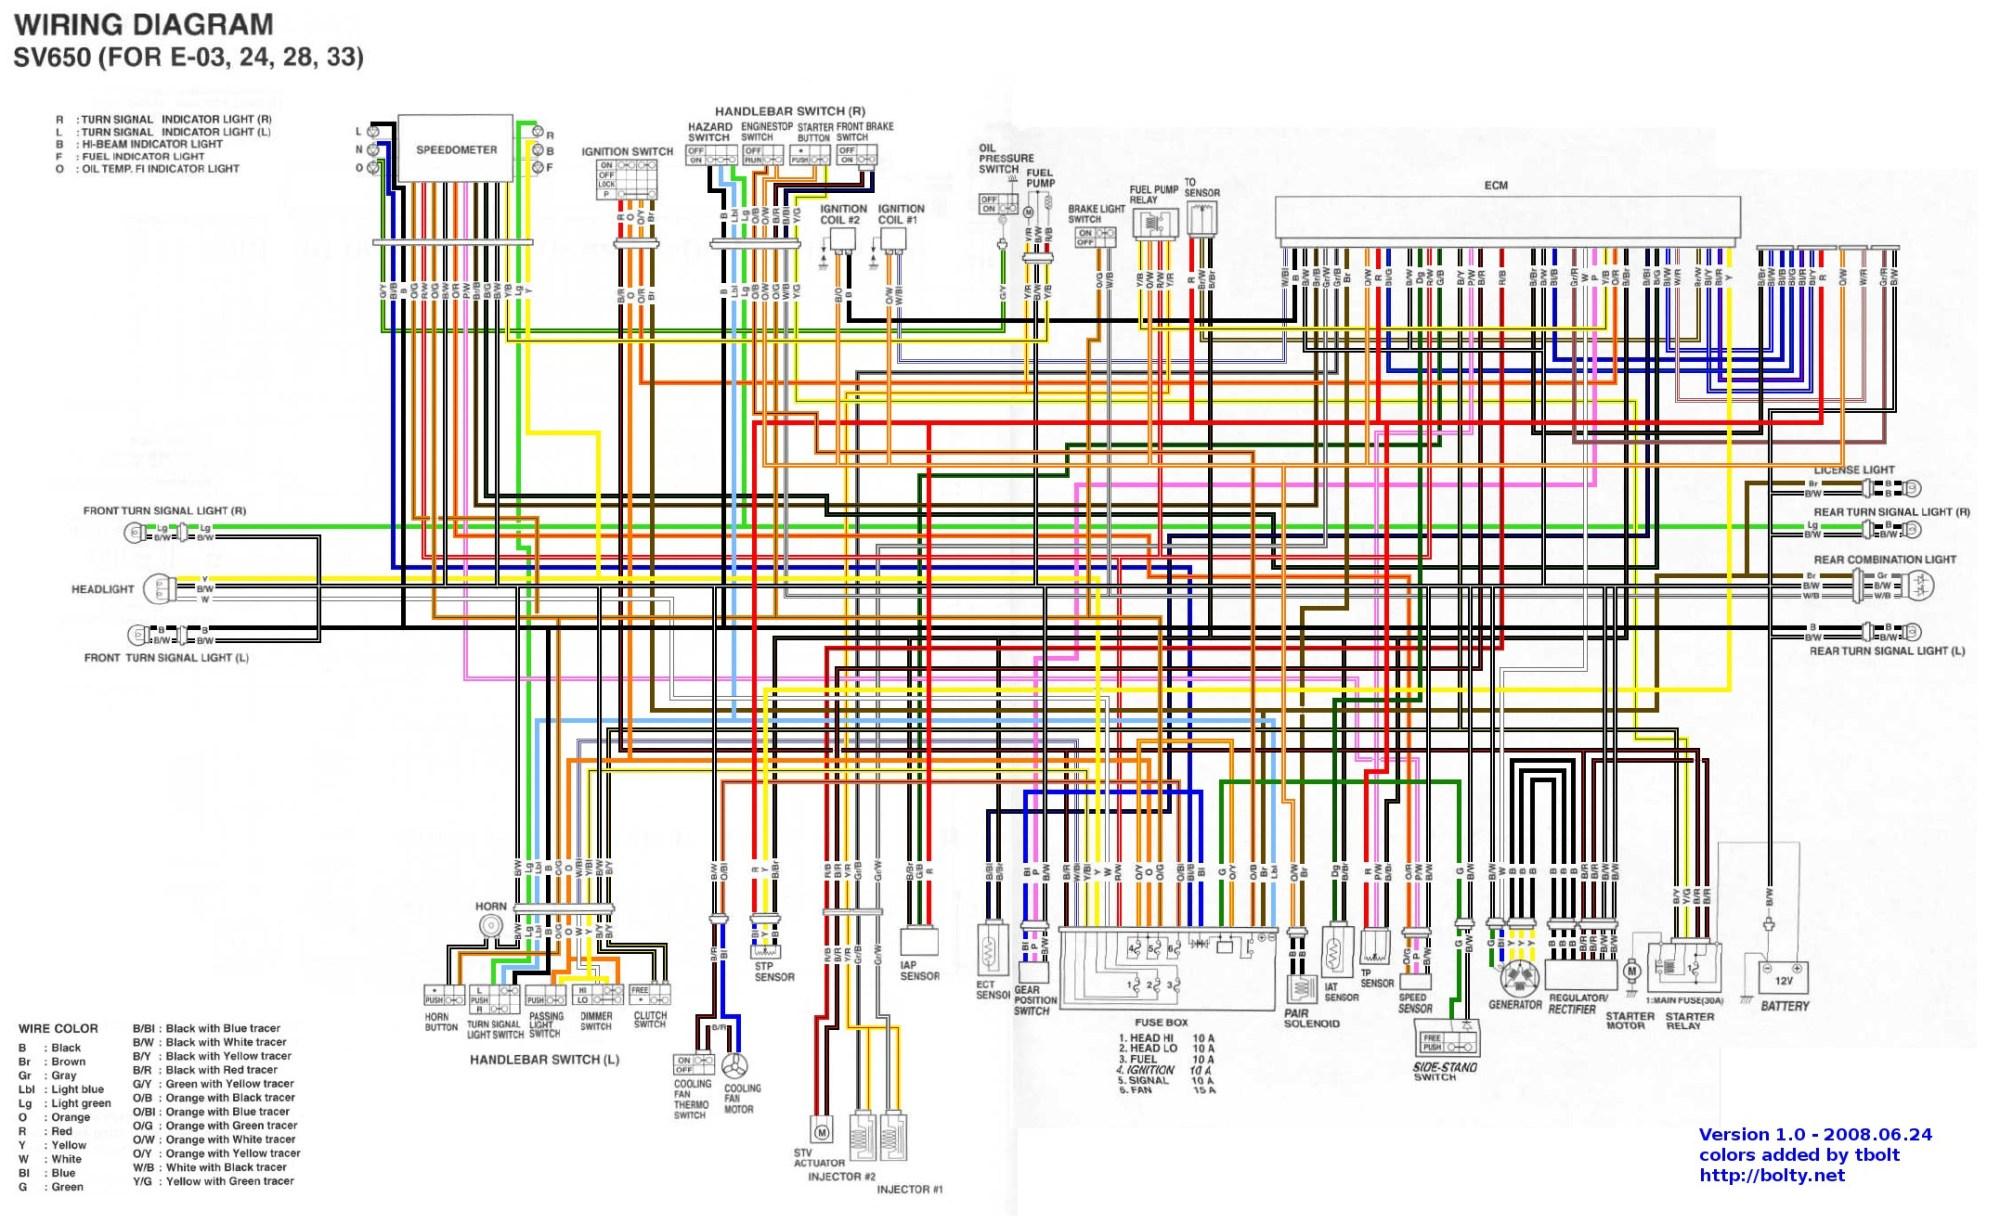 hight resolution of  600 wiring diagram images gallery suzukisavage com rewinding stator help please 2013 cbr 250 specs 1990 yamaha fzr 1000